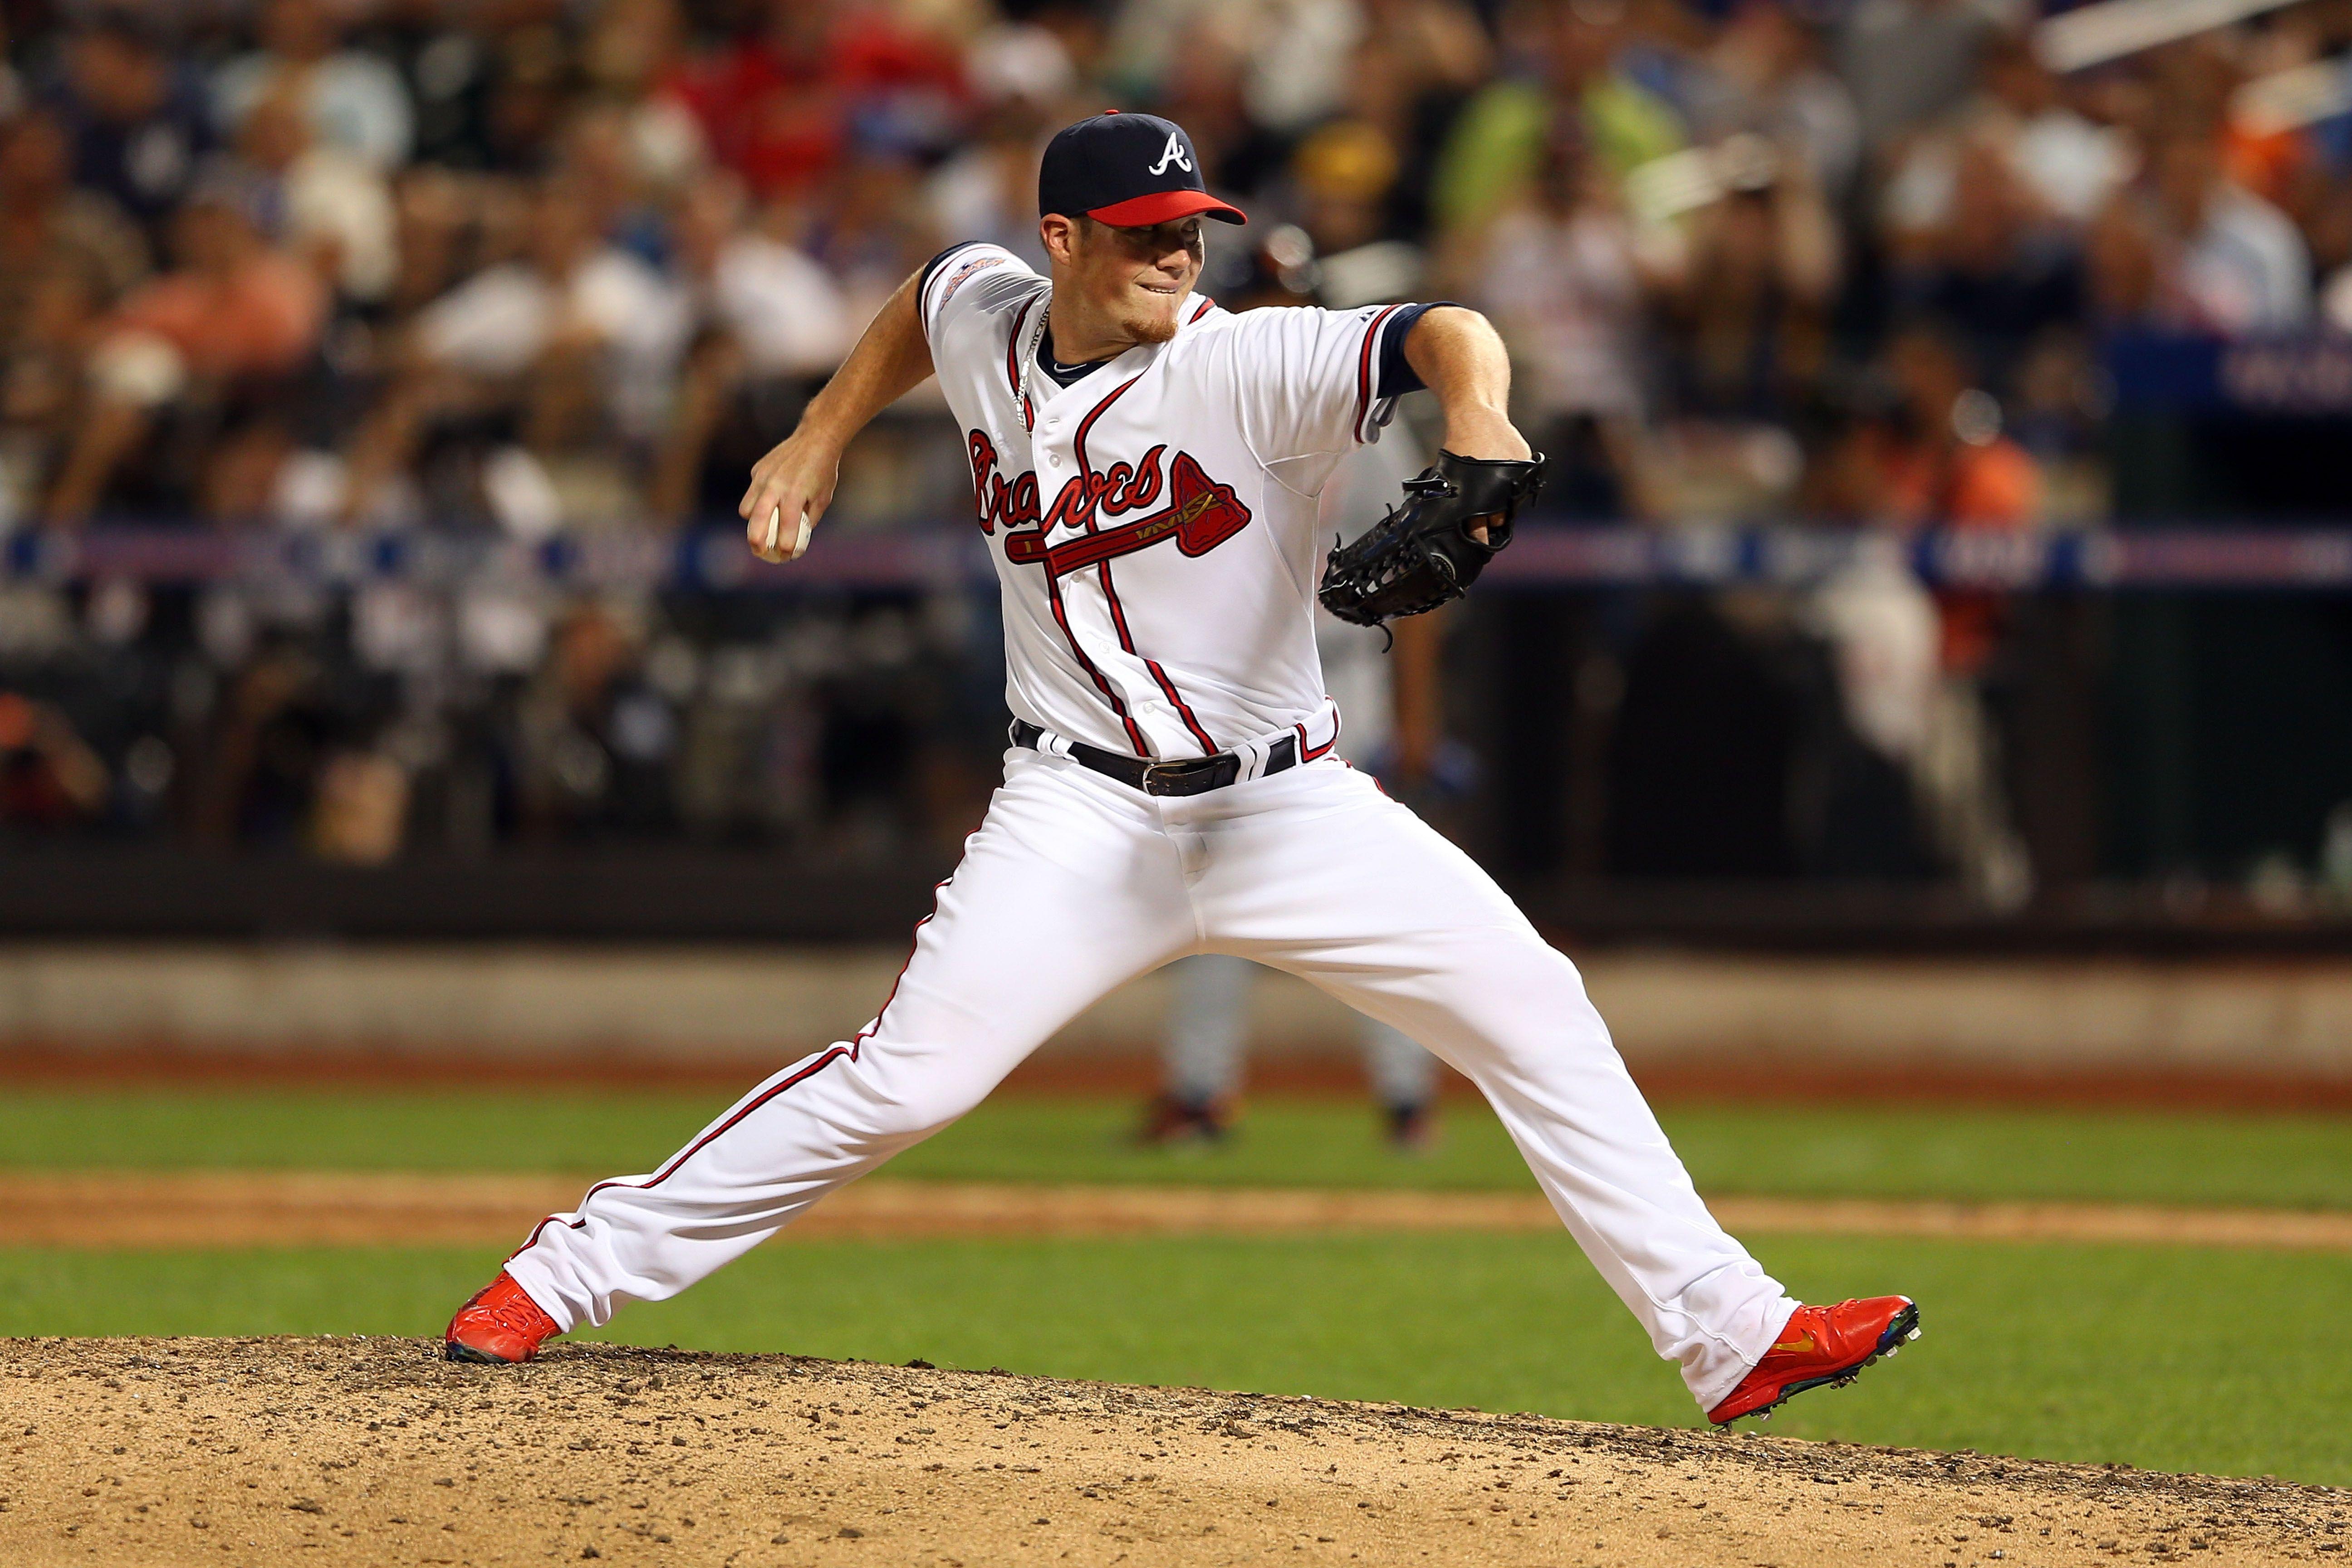 Atlanta Braves Pitcher Craig Kimbrel Throws An Inning In The 2013 All Star Game Atlanta Braves Braves Atlanta Braves Baseball